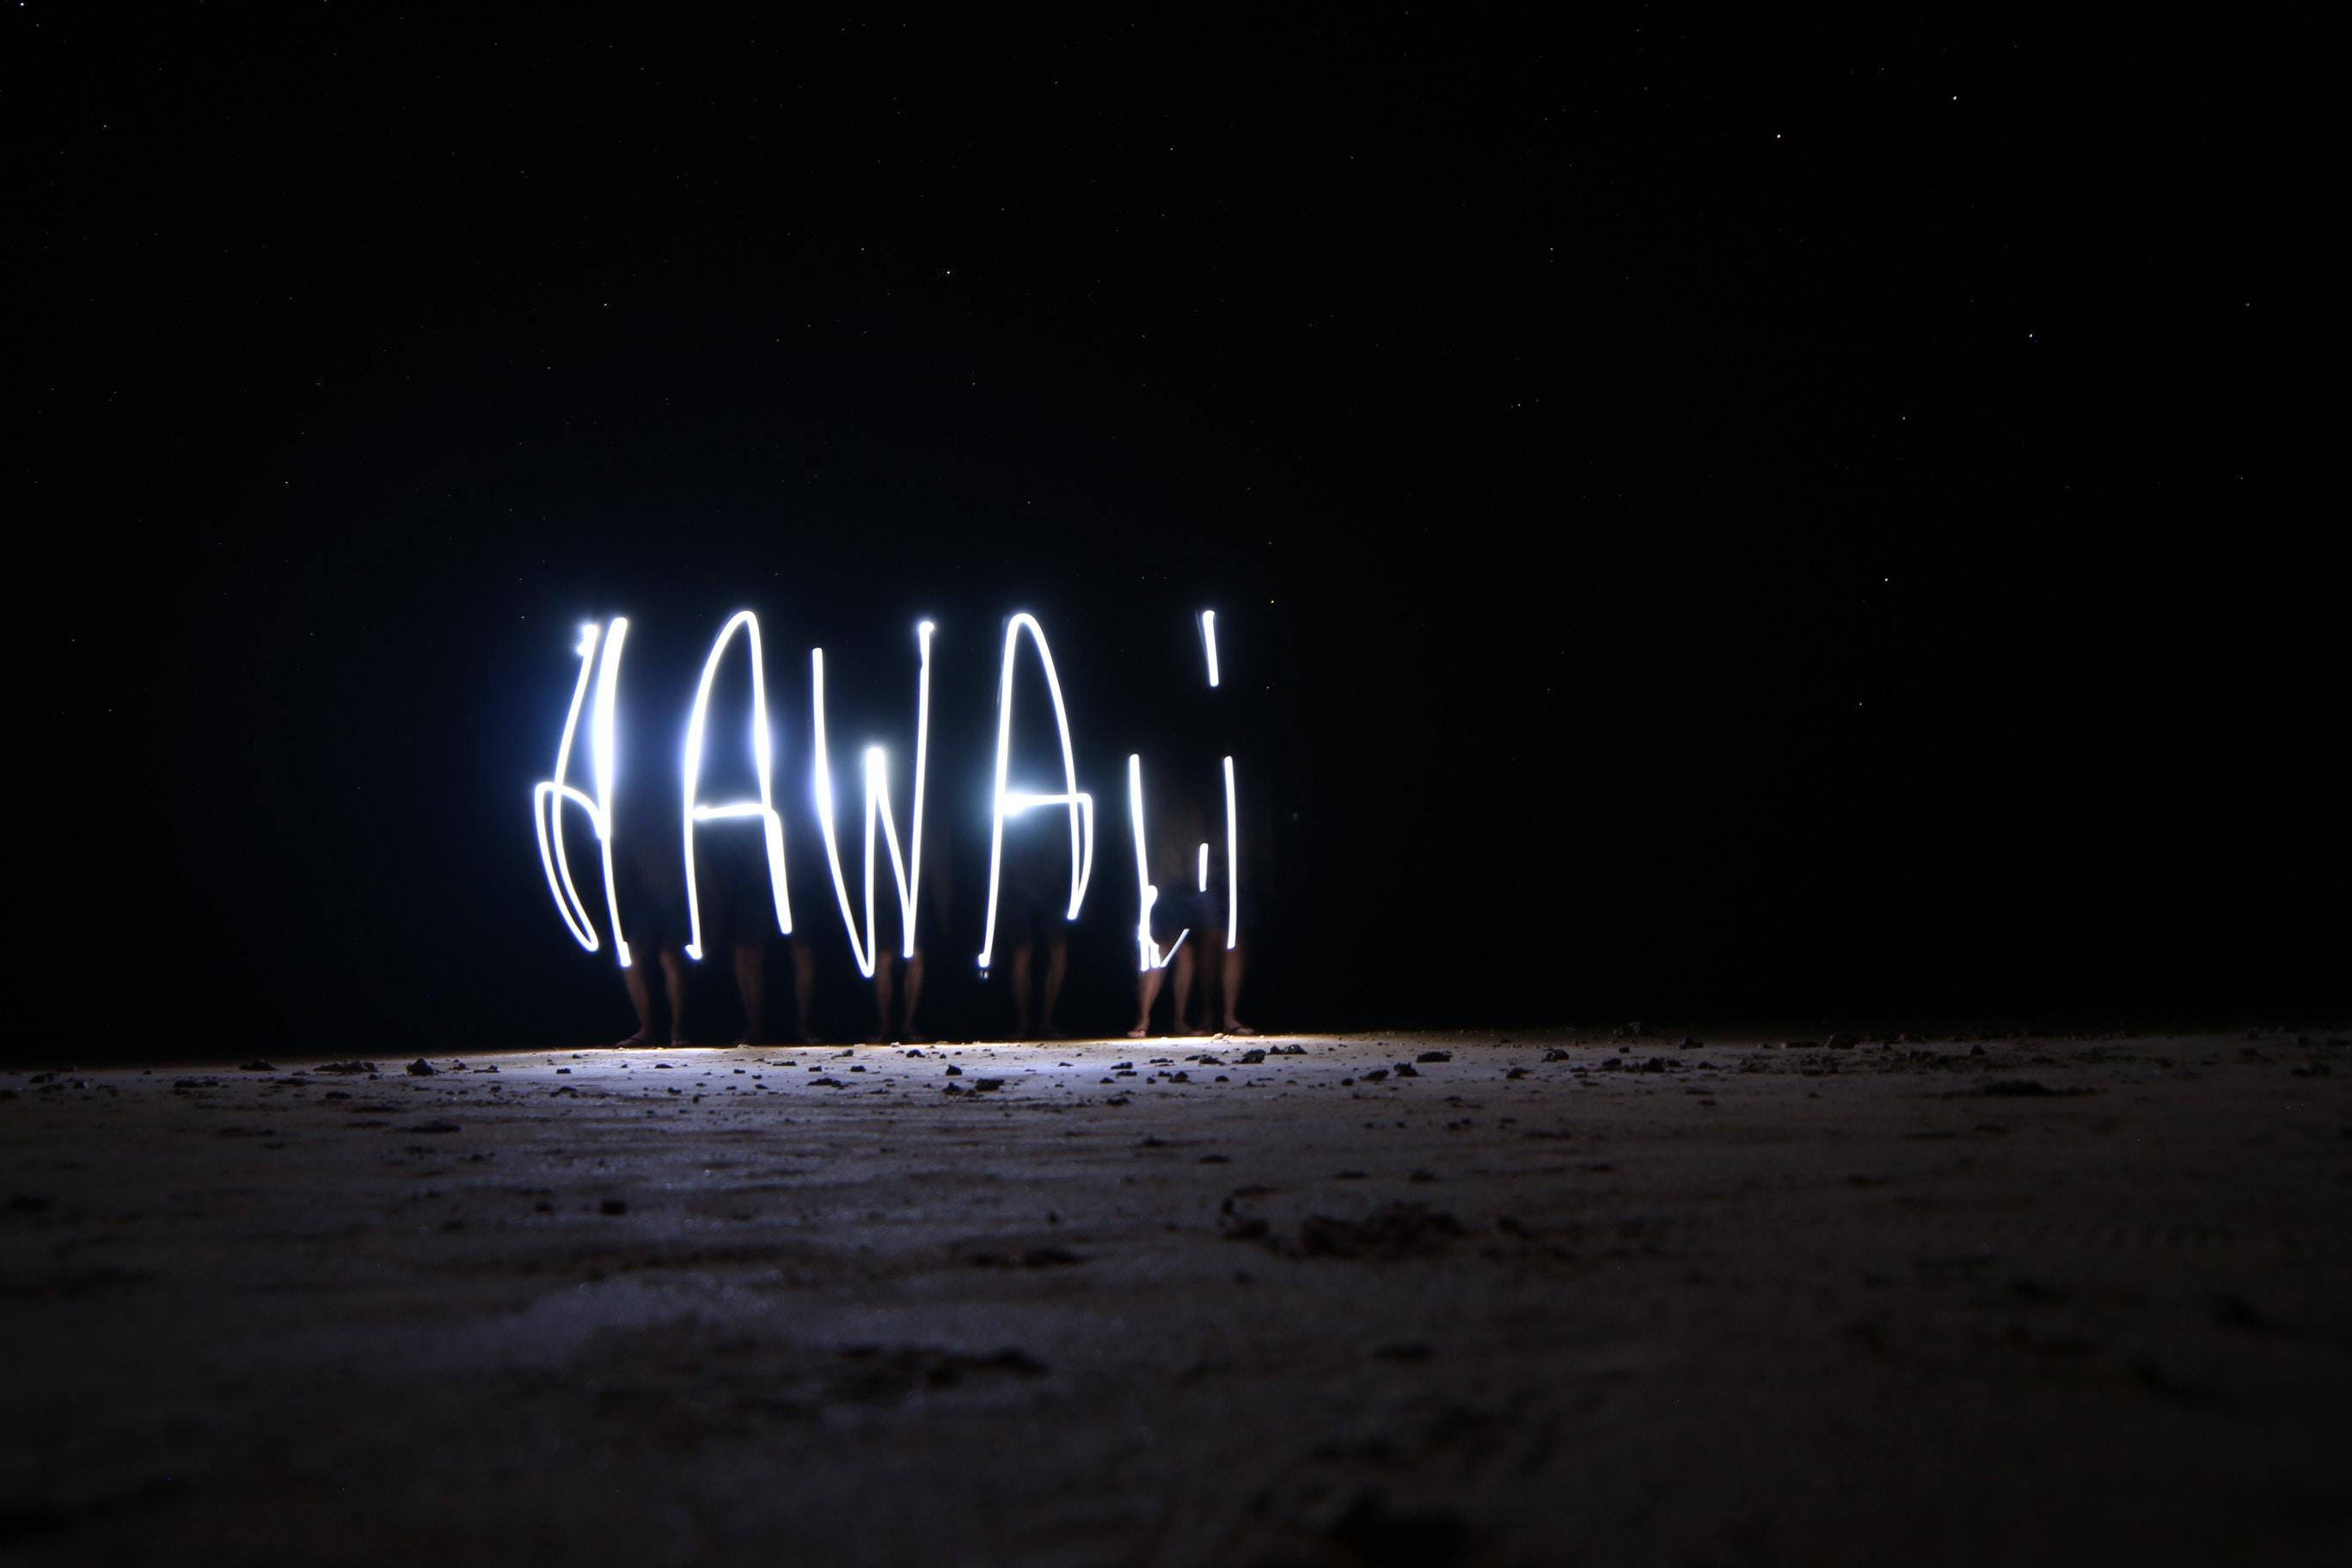 LED light forming Hawaii word